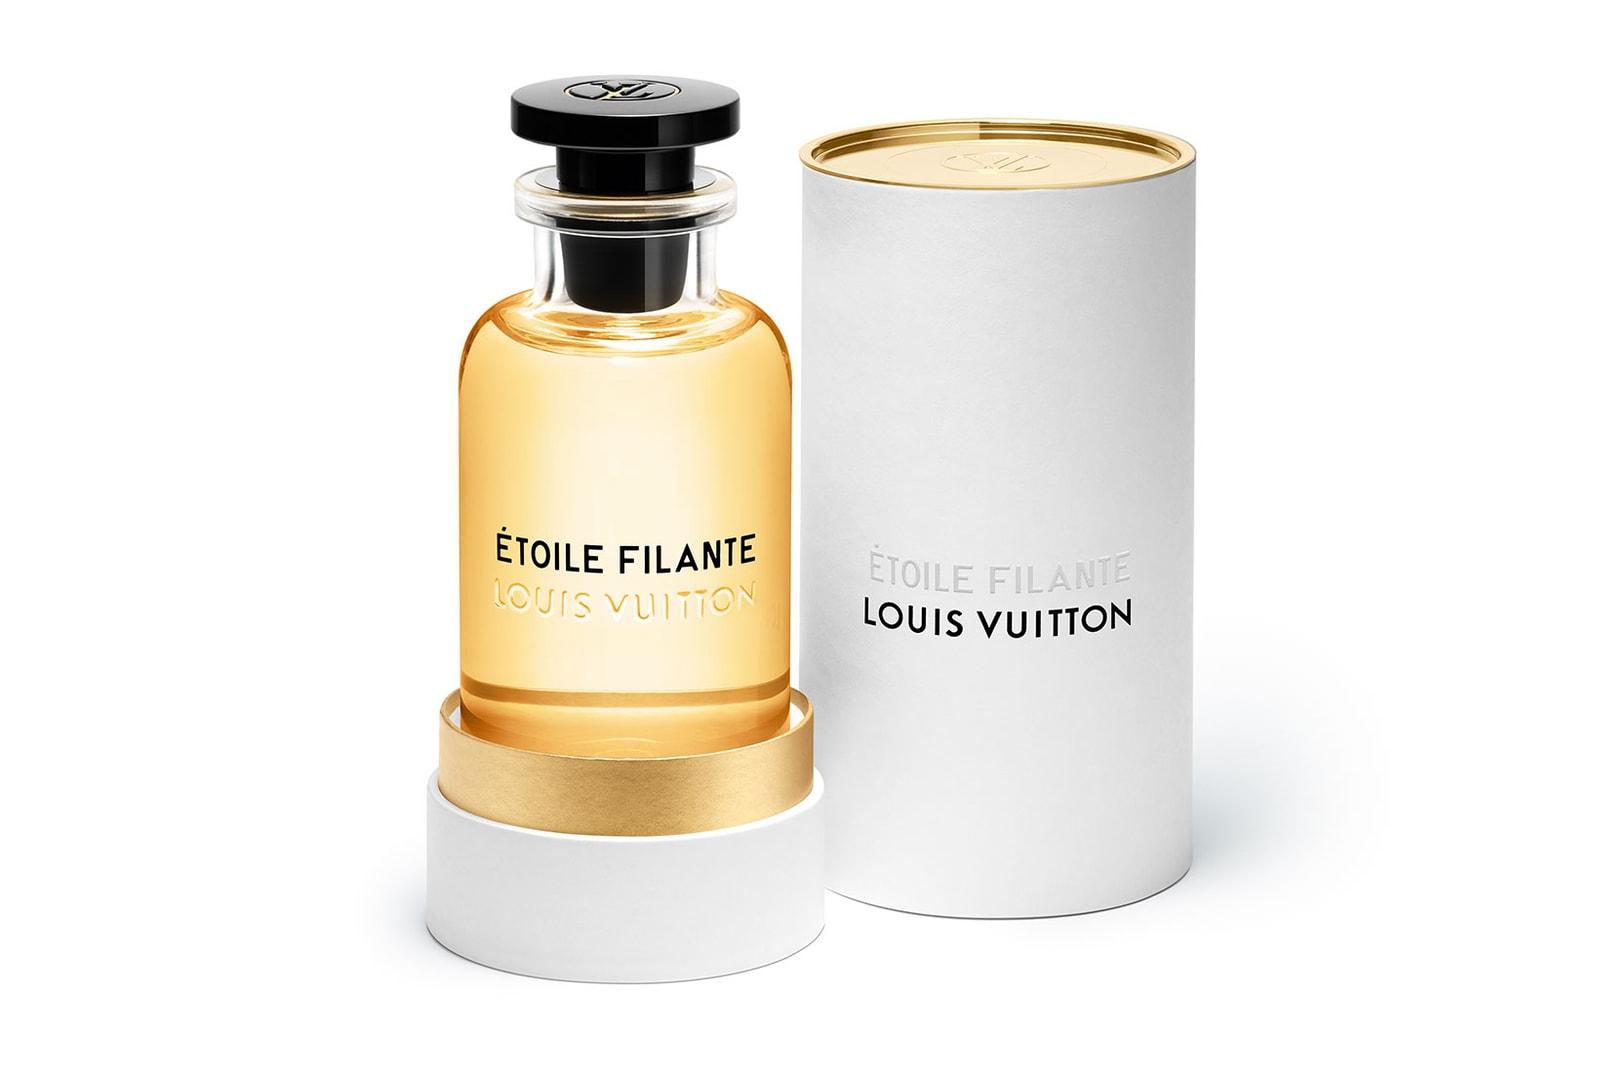 louis vuitton lv perfume fragrances scents etoile filante product packaging bottle gold yellow